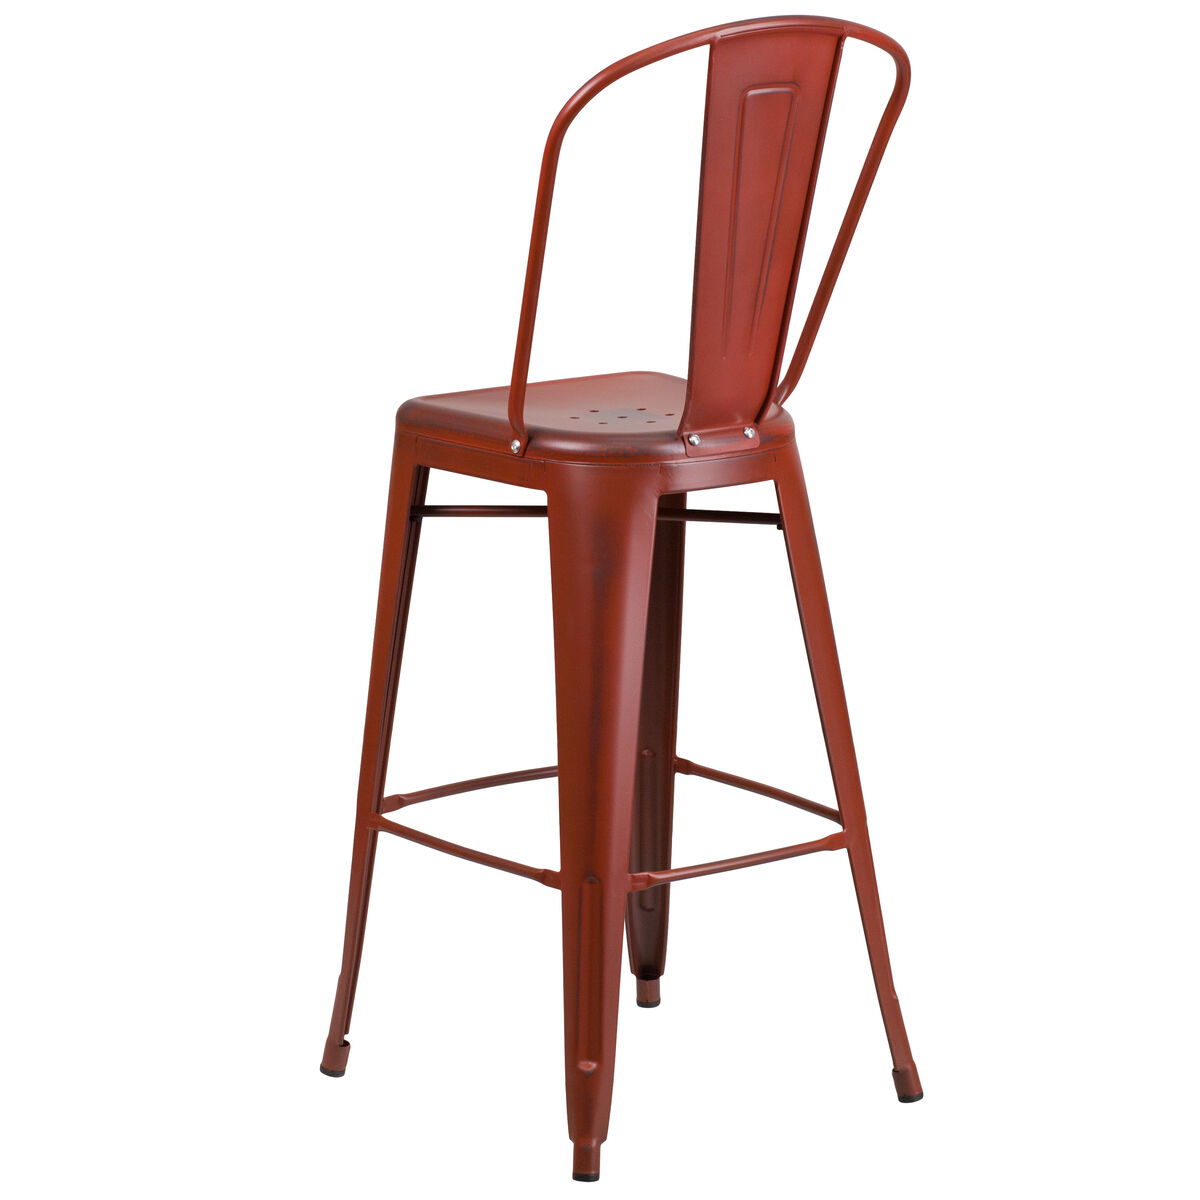 Distressed Red Metal Stool Et 3534 30 Rd Gg Bizchair Com